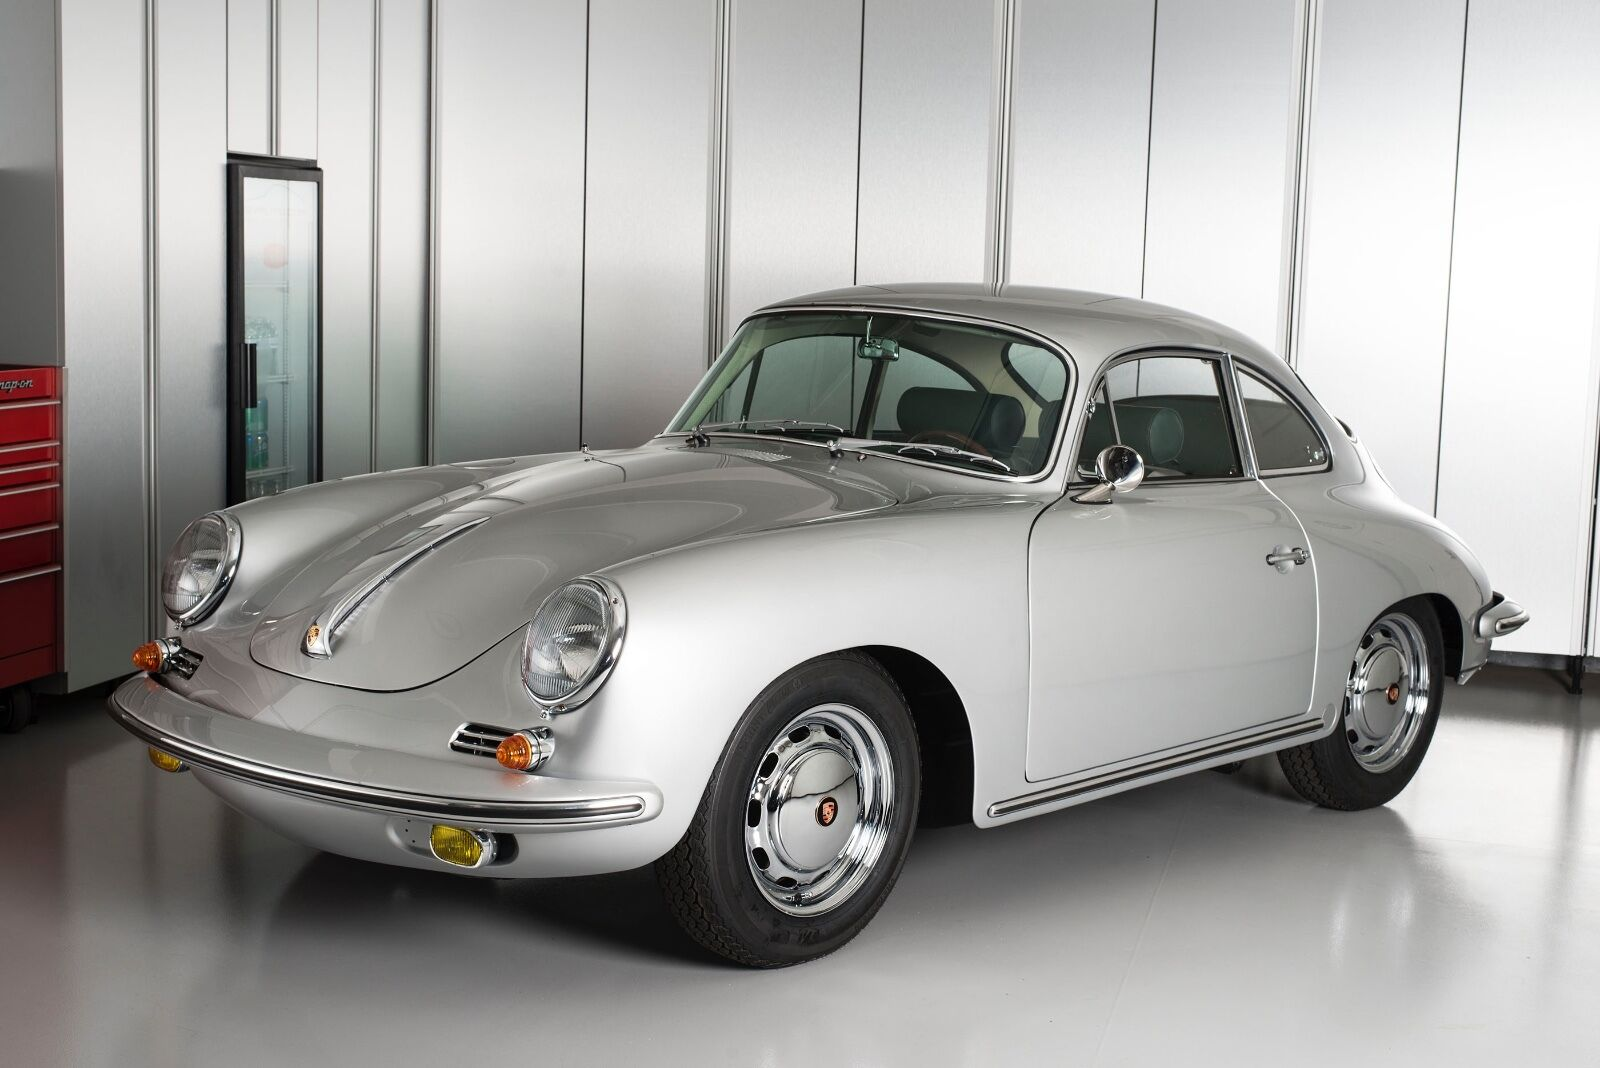 1965 Porsche 356  1965 Porsche 356, C2 Tribute Car. Professional every nut and bolt restoration.